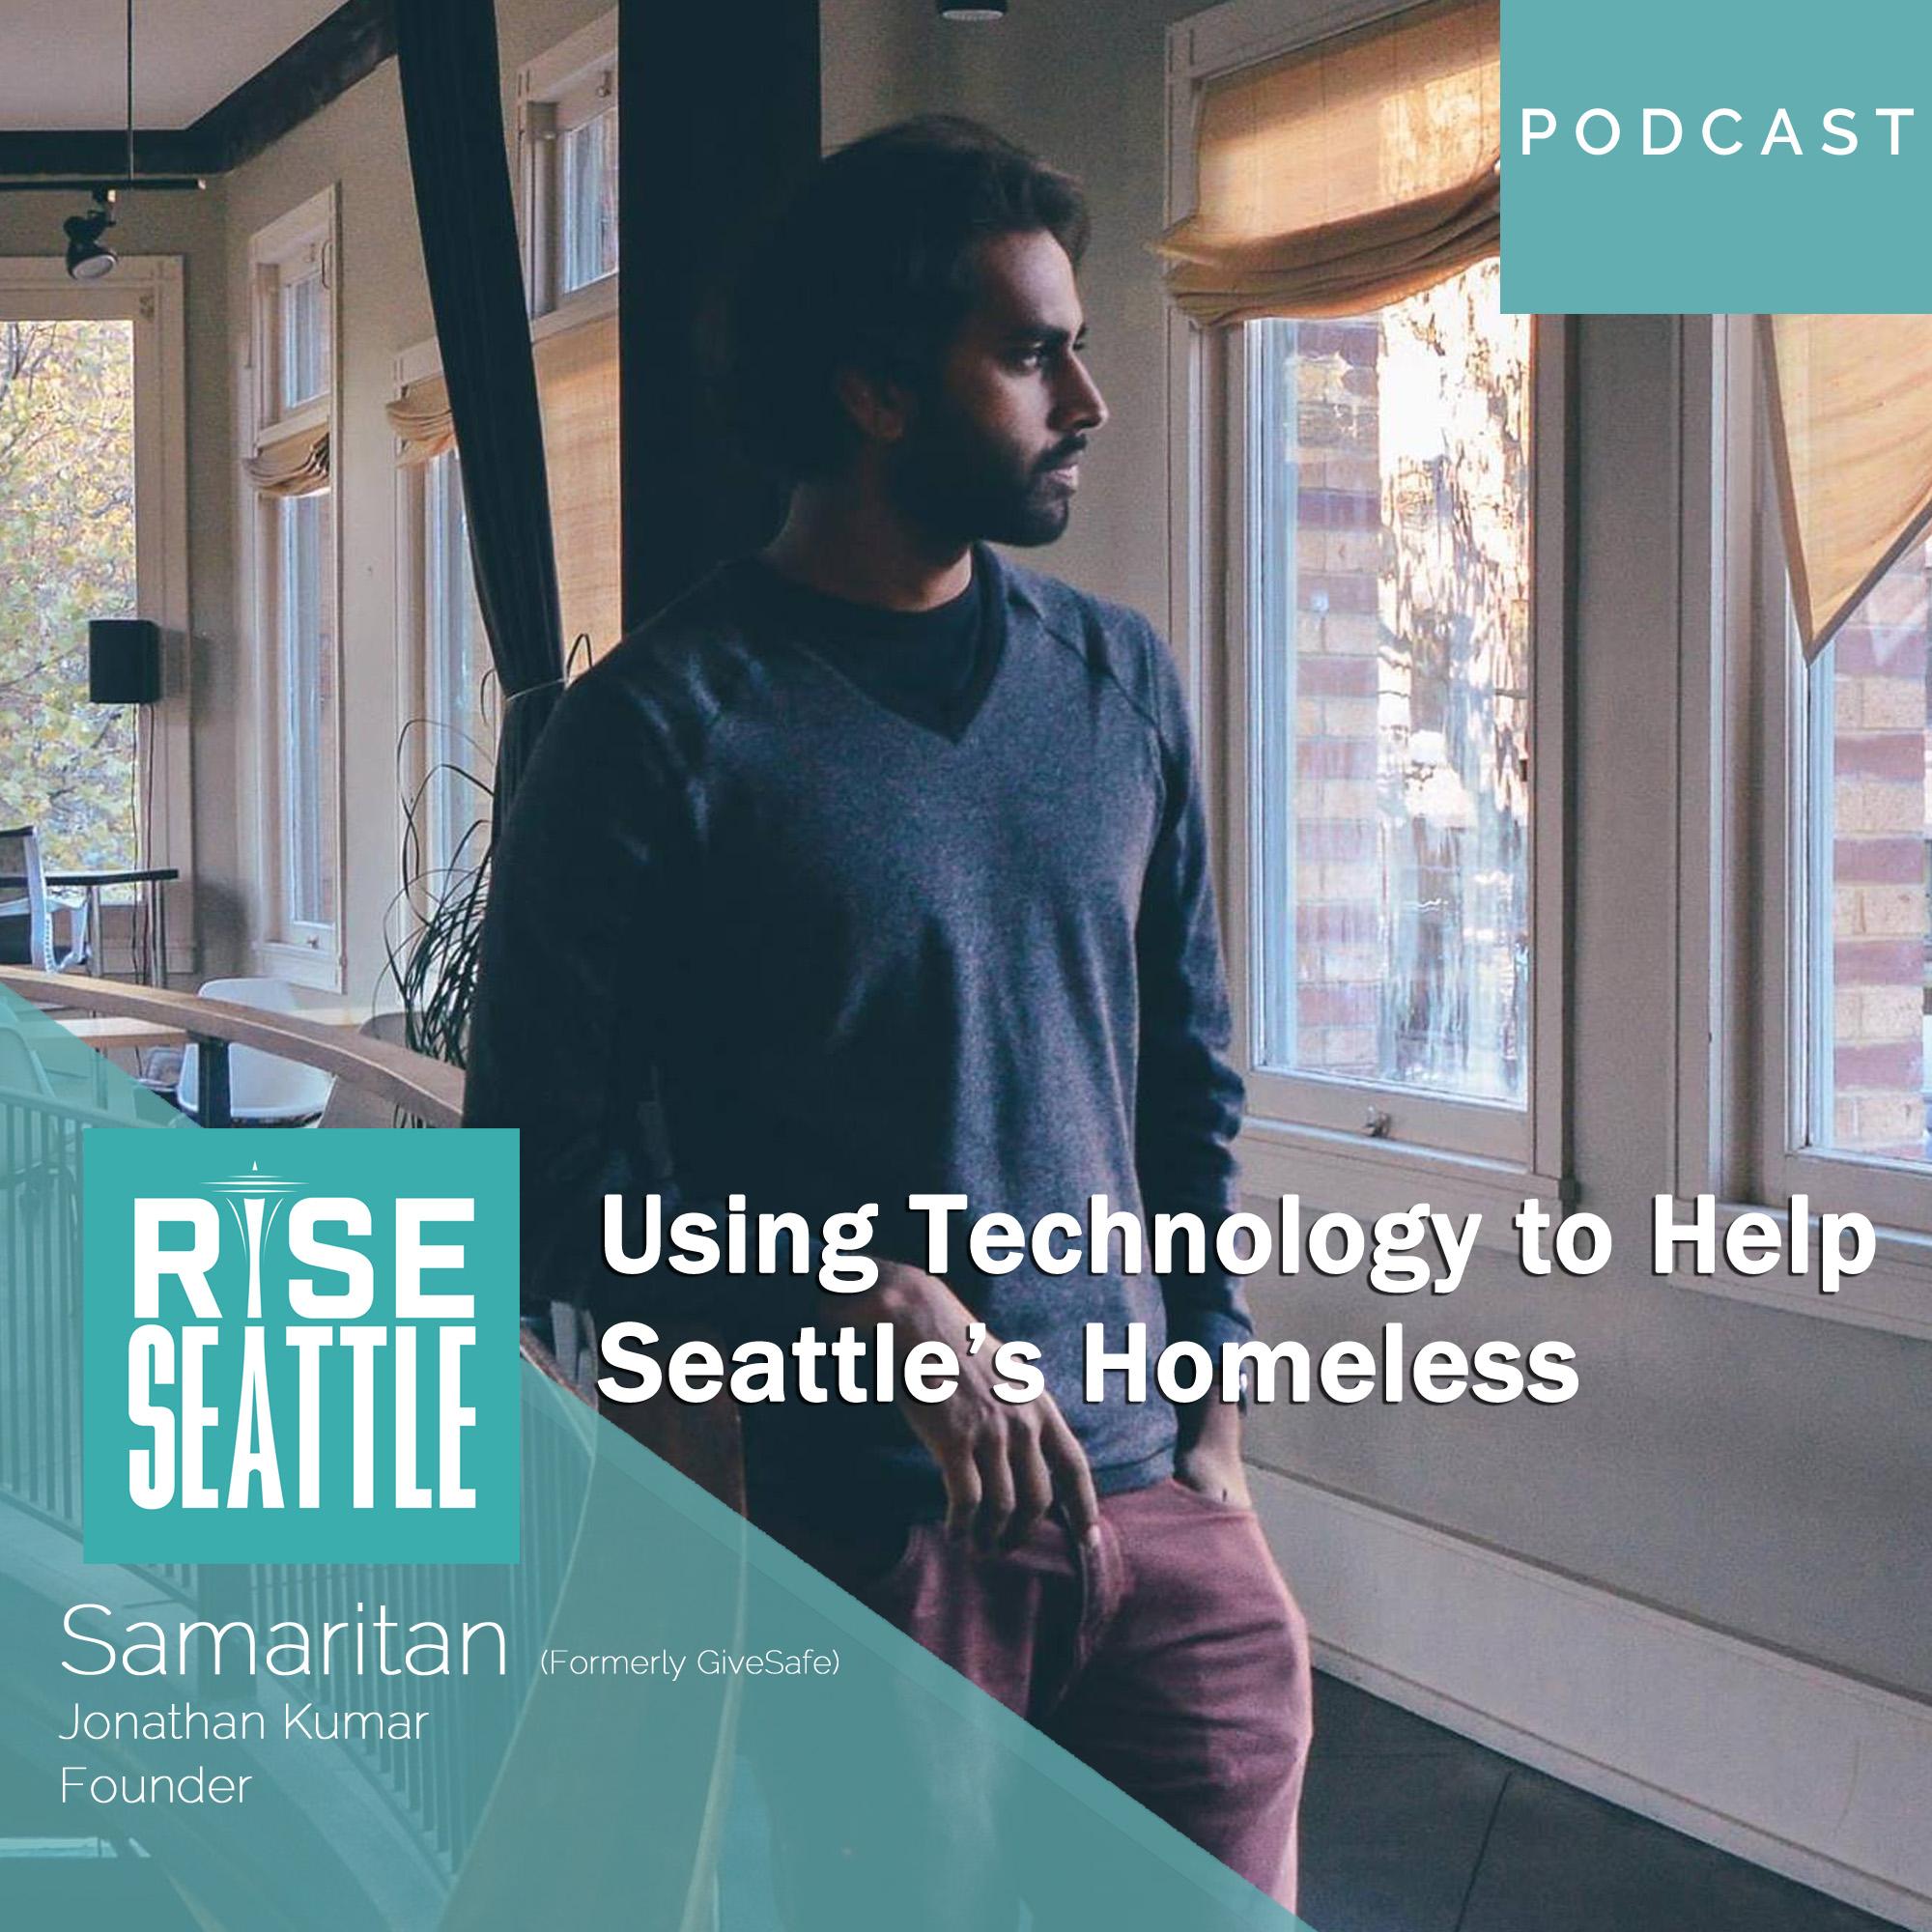 S1.E10 Jonathan Kumar: Using Technology to Help Seattle's Homeless